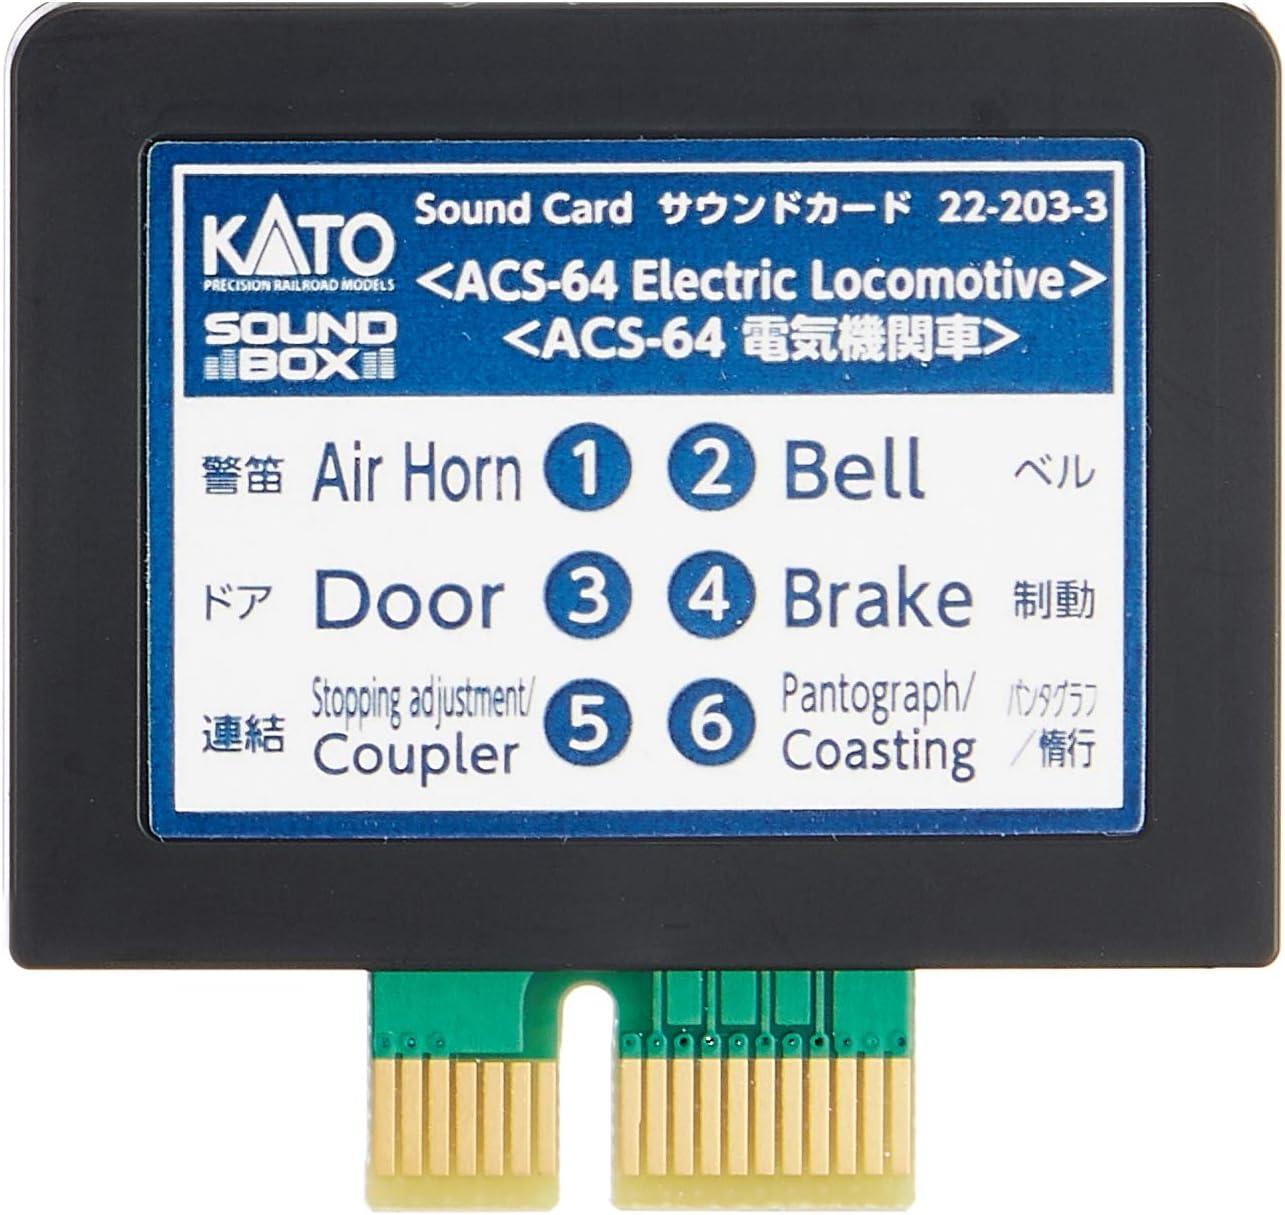 Kato 22-203-3 UNITRACK Sound ACS-64 Card Max 44% OFF Max 46% OFF Electric Locomotive